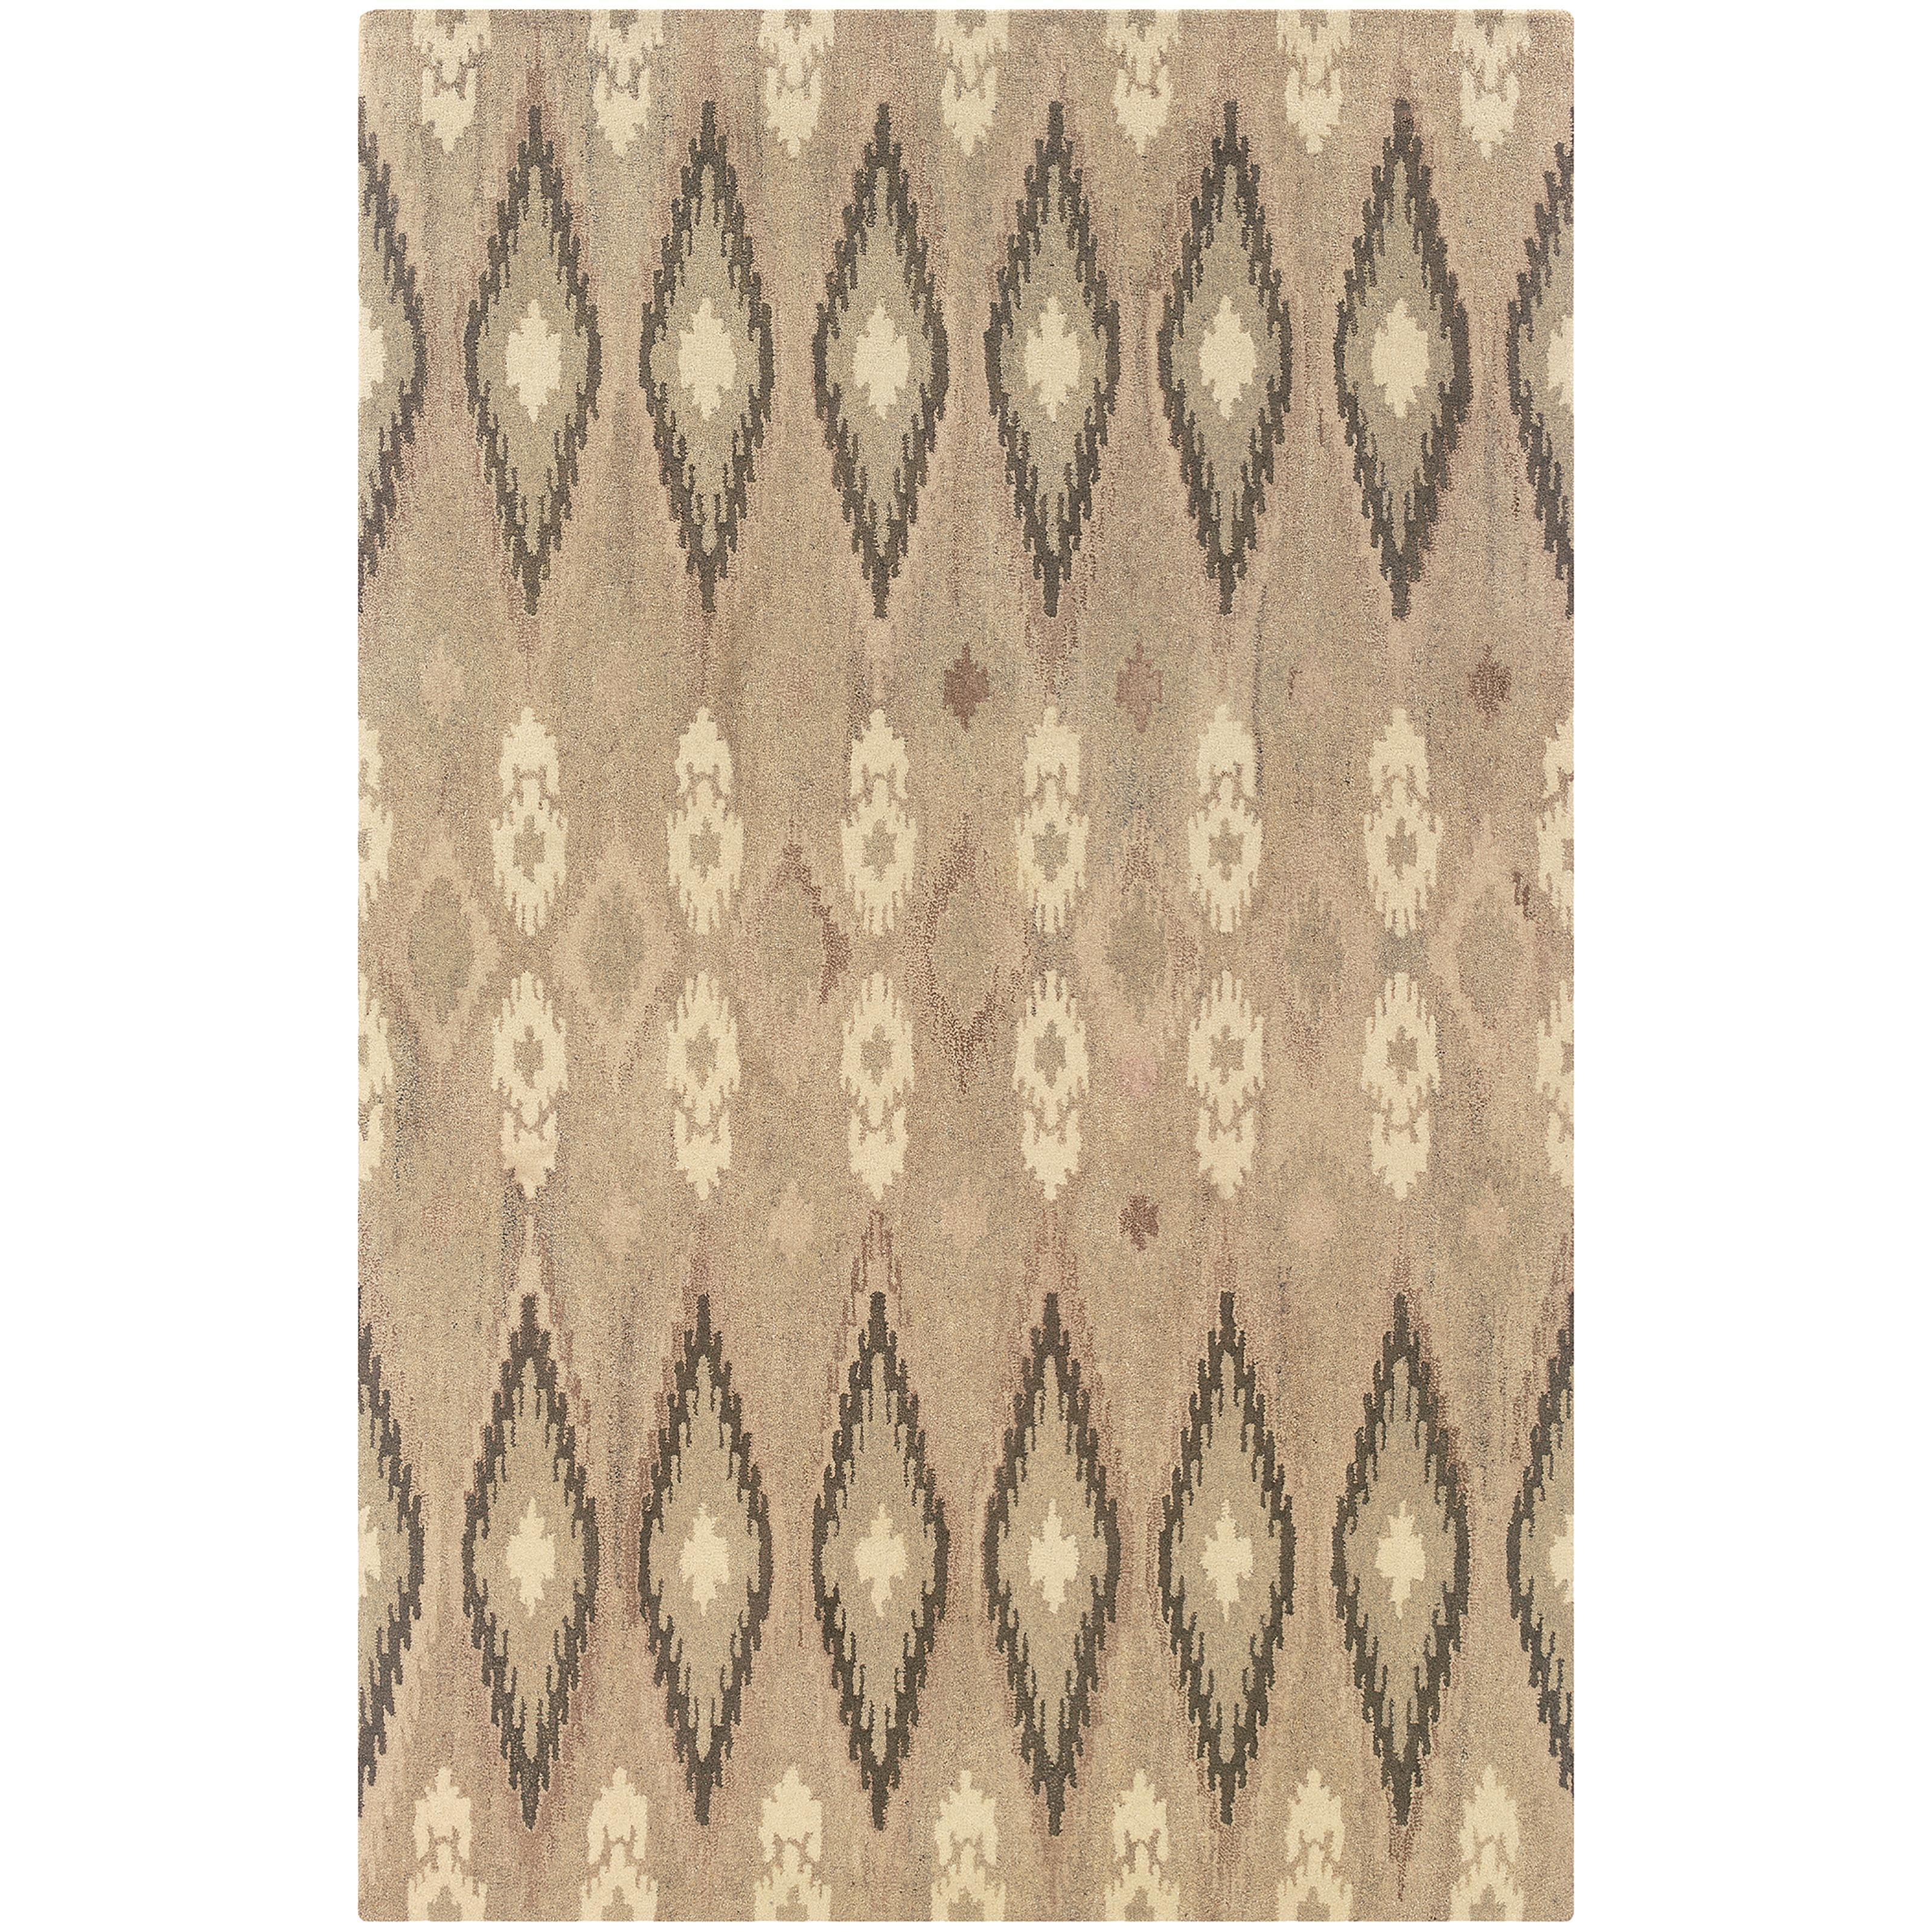 "Anastasia 10' 0"" X 13' 0"" Rug by Oriental Weavers at Novello Home Furnishings"